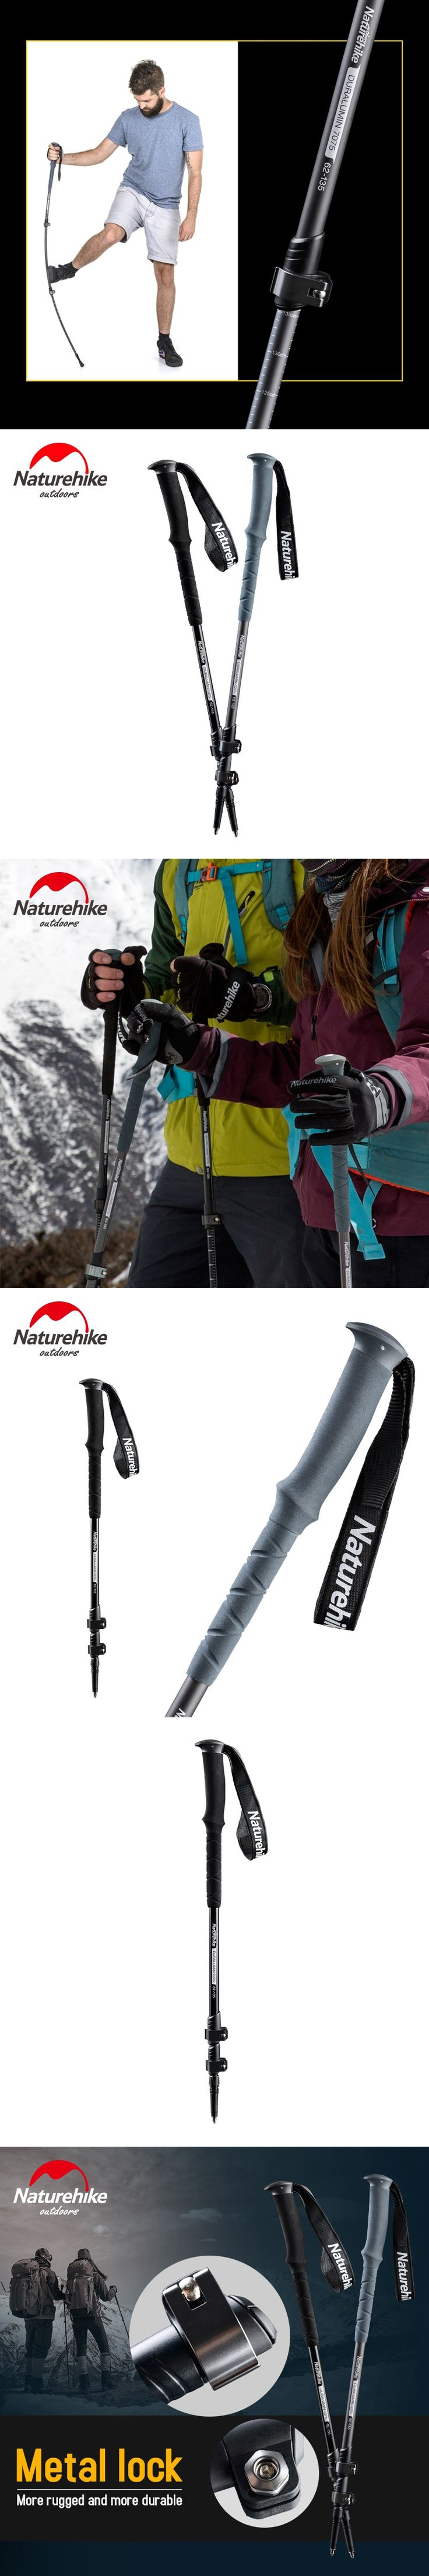 1pc Naturehike Ultra-light Walking Poles Carbon Steel Aluminum Adjustable 3-SectionHiking Alpenstock Trekking Poles 270g